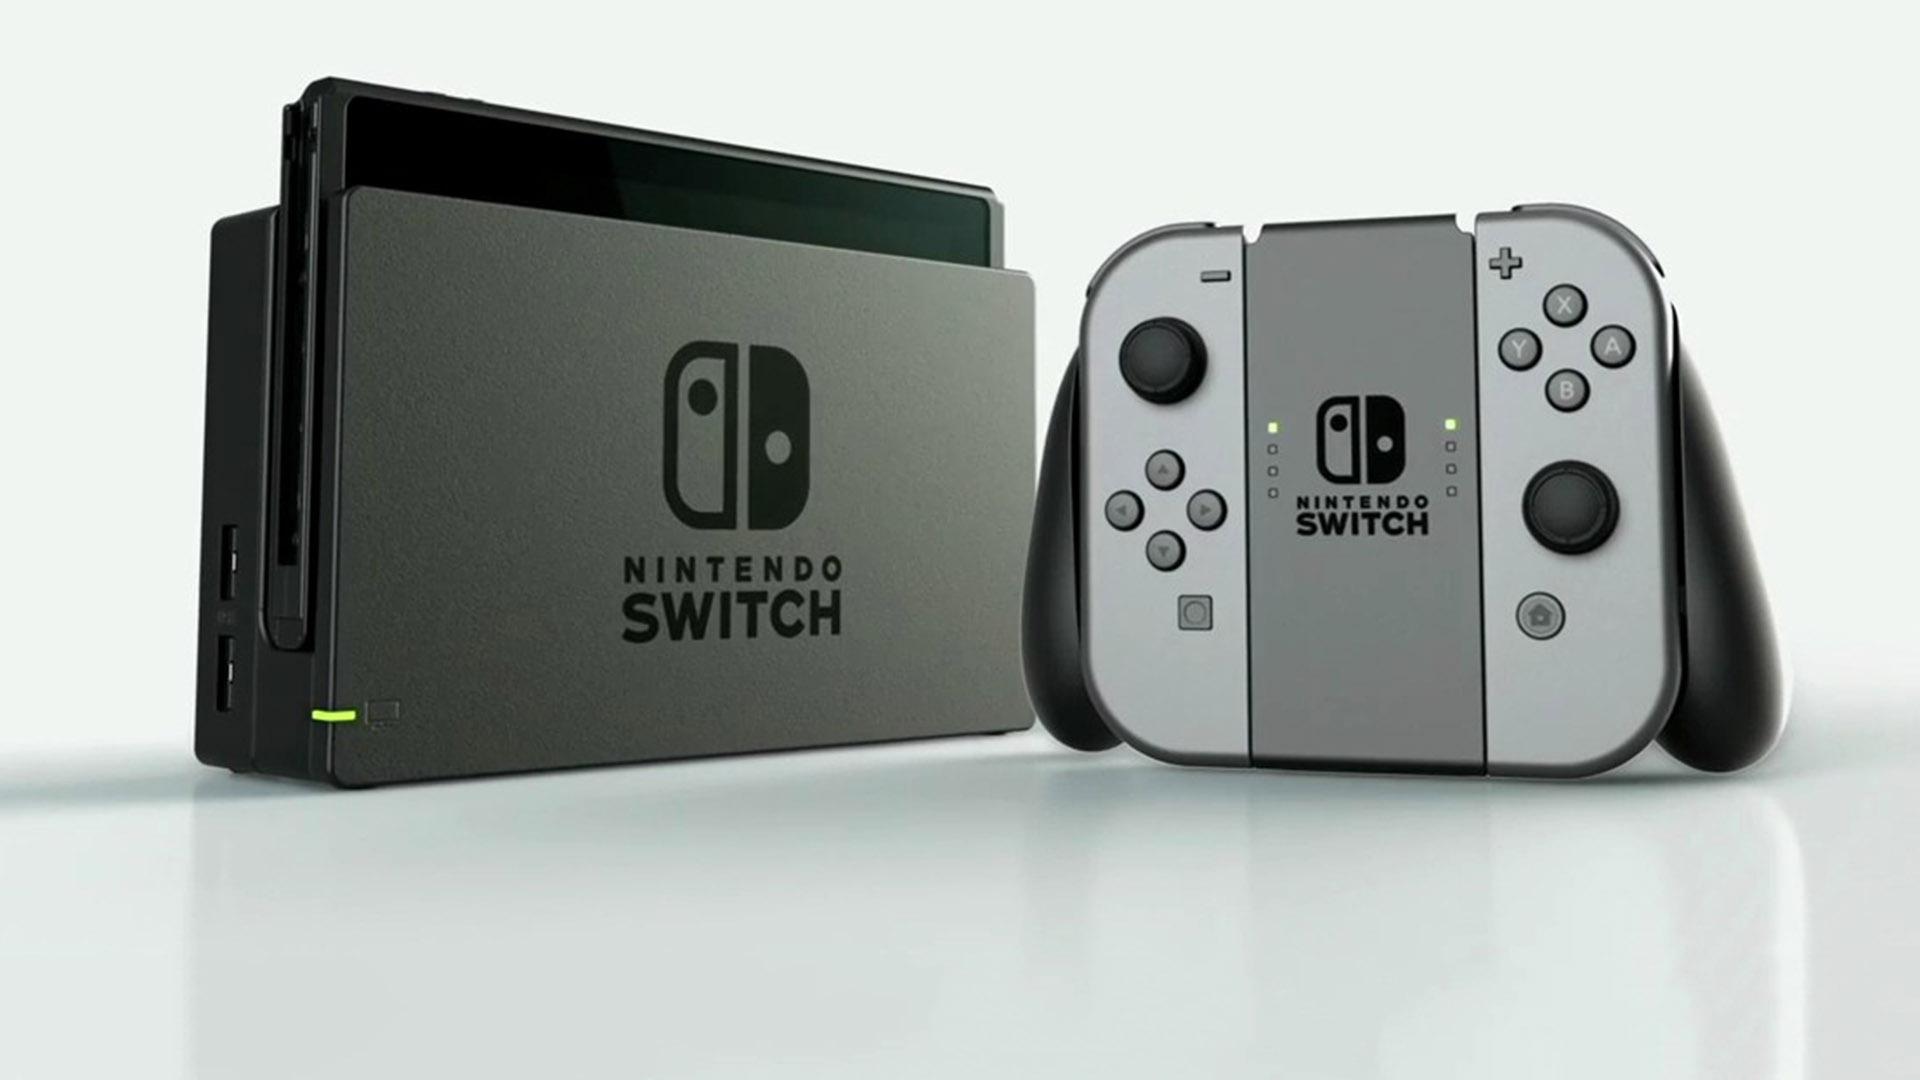 Nintendo-Switch-Presentation-2017.mp4_000502066.jpg